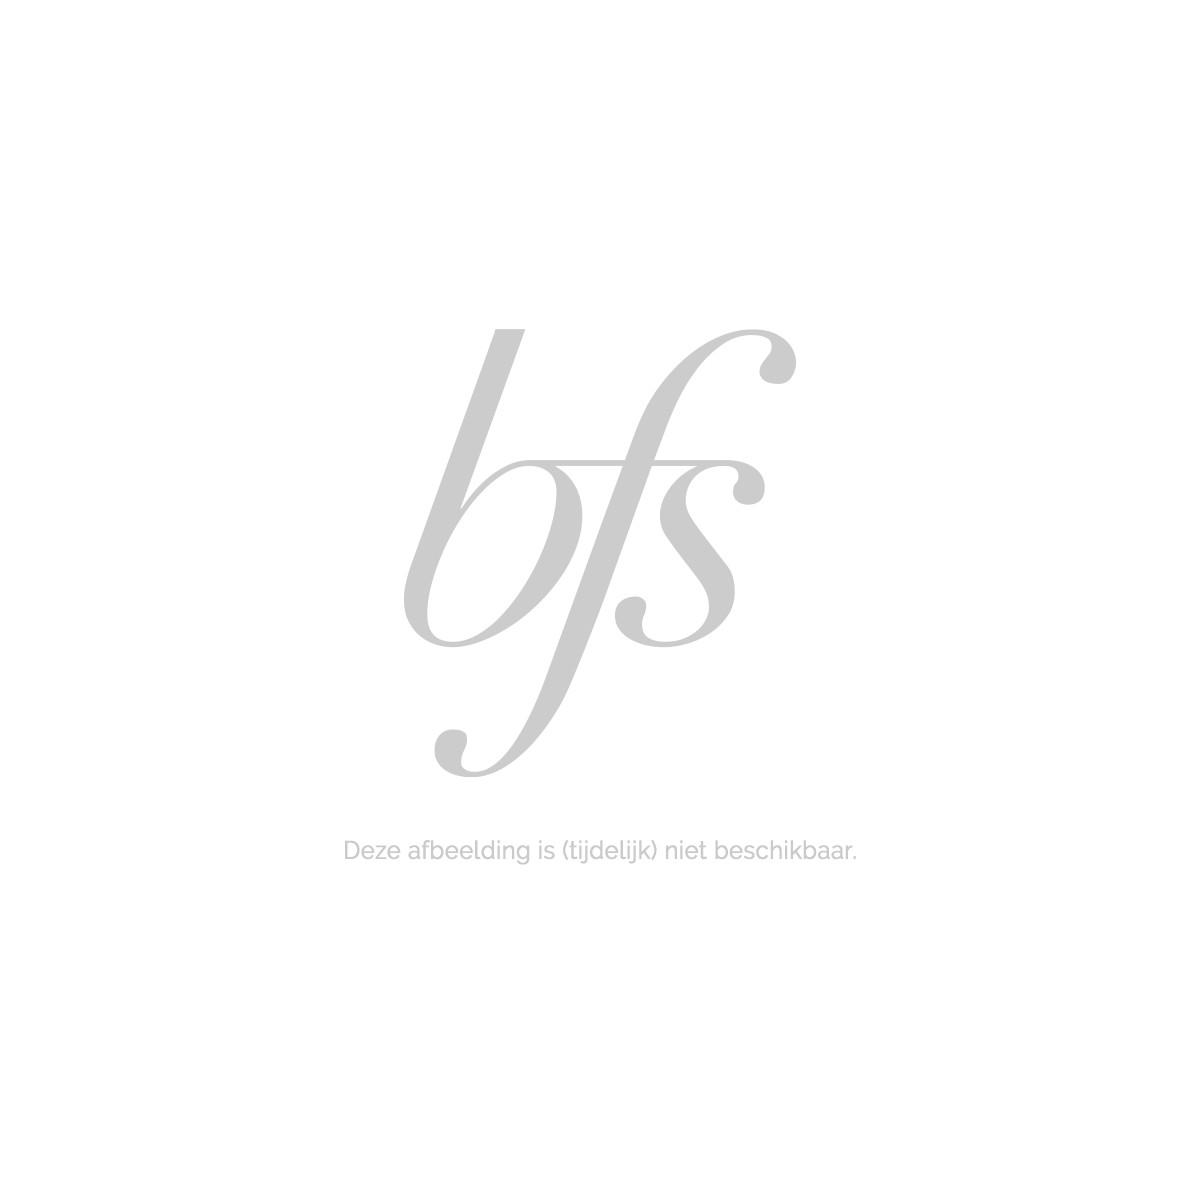 Chanel Egoiste Pour Homme Deodorant 75 ml